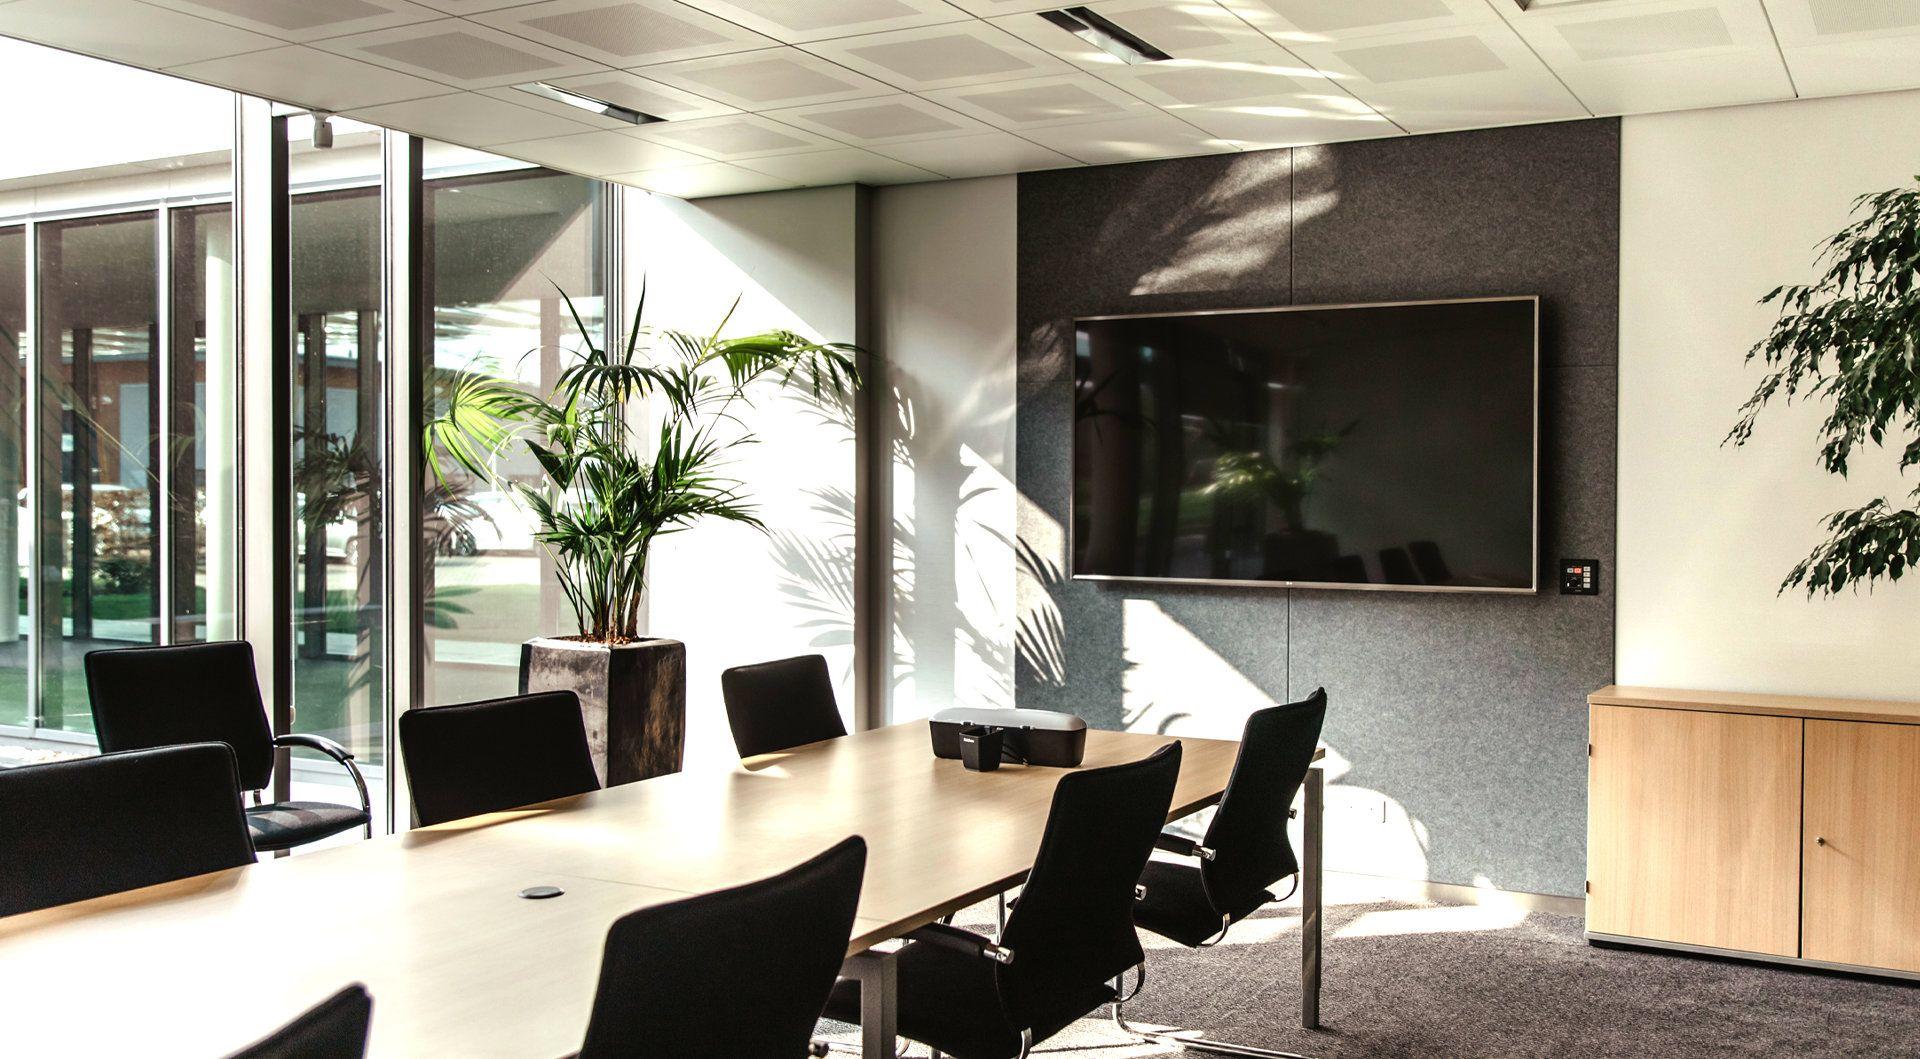 "LG 24BK550Y-B LED display 61 cm (24"") 1920 x 1080 Pixels Full HD Flat Zwart - Case studie de vries"